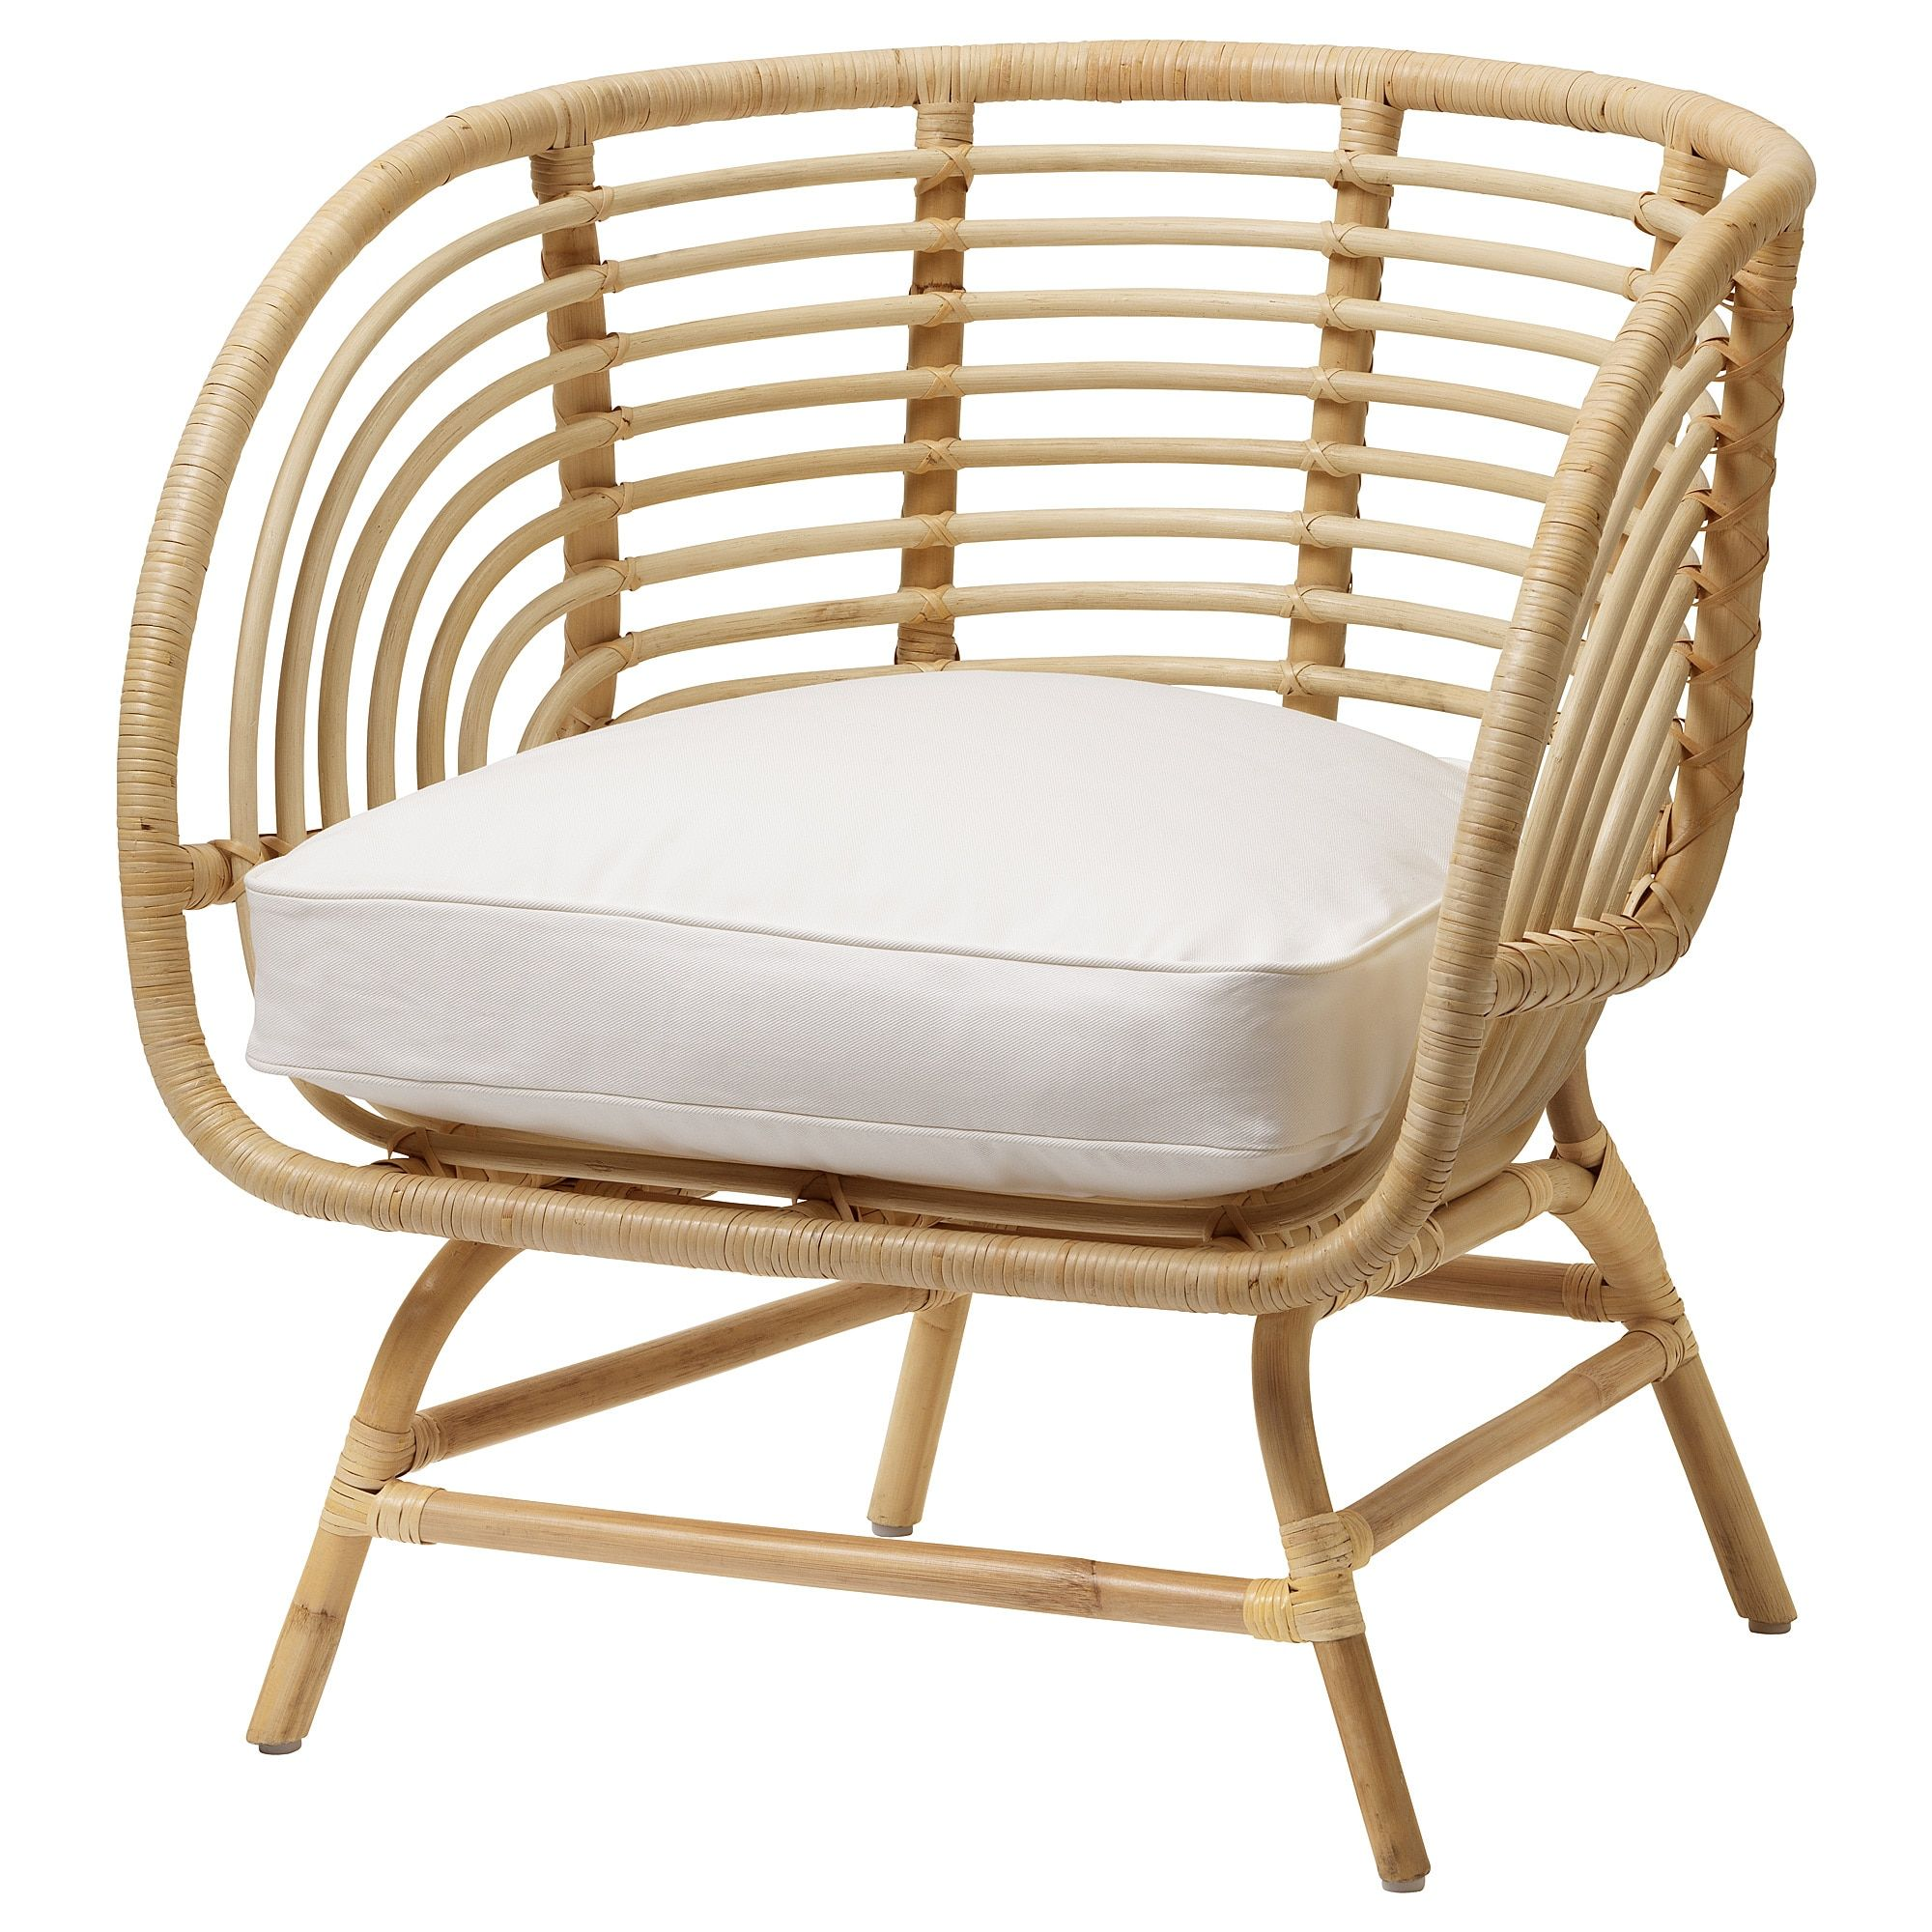 BUSKBO Armchair rattan, Djupvik white Rattan armchair